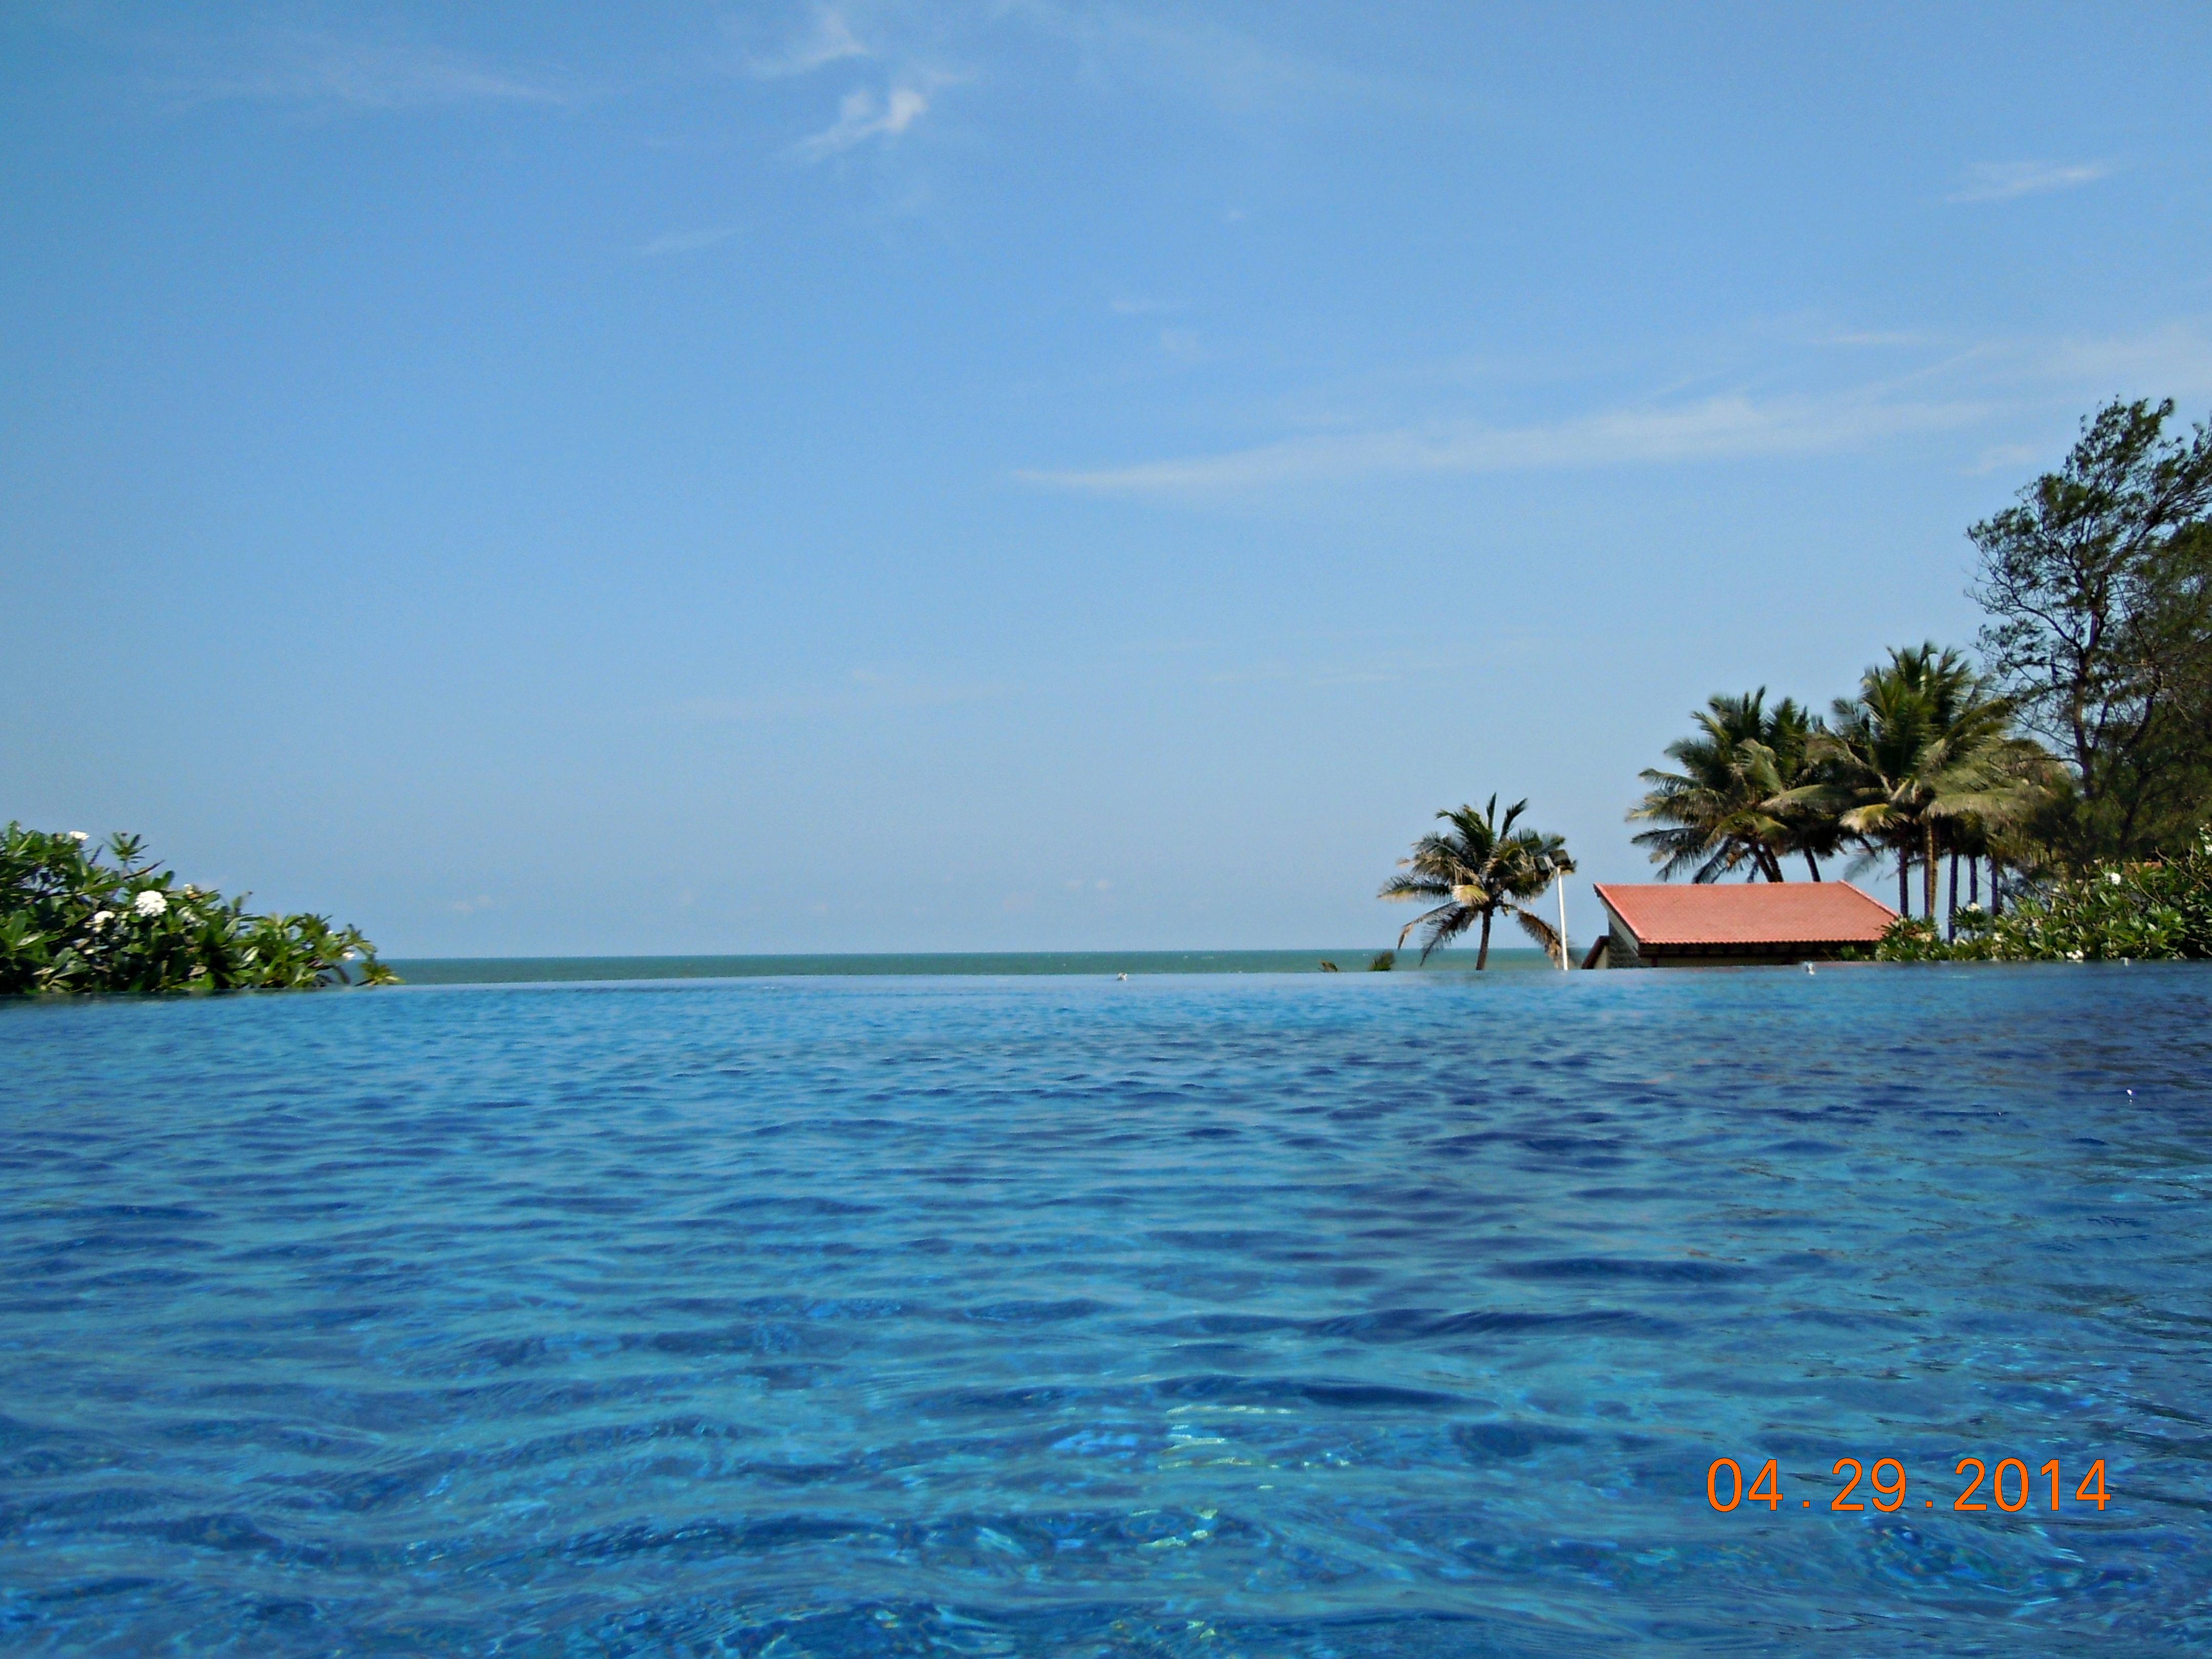 The beautiful infinity pool